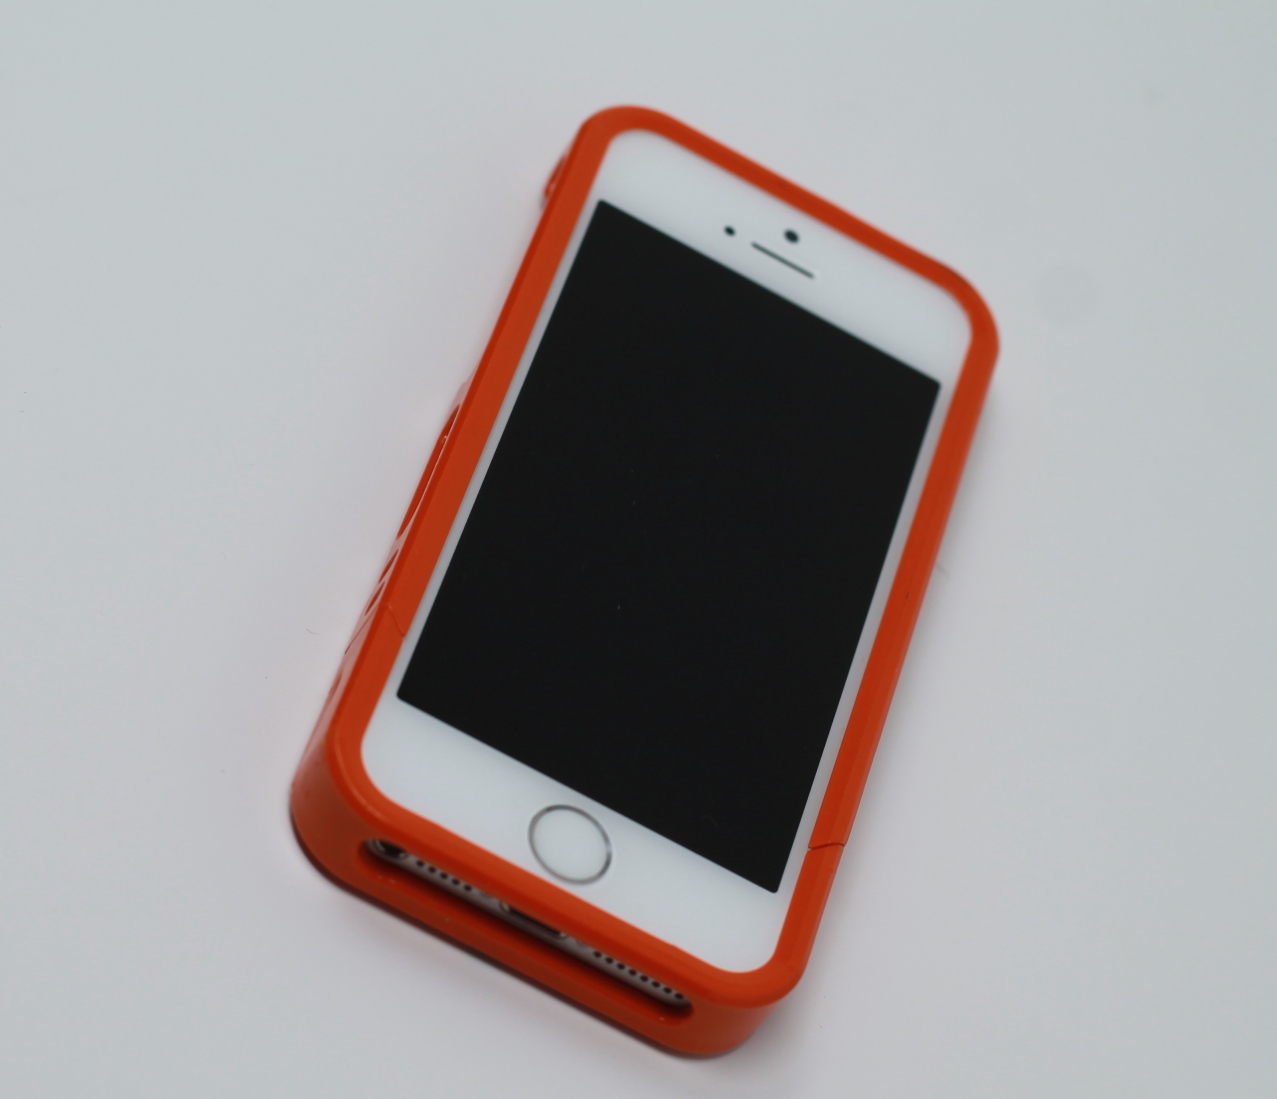 iphone 4 rockform